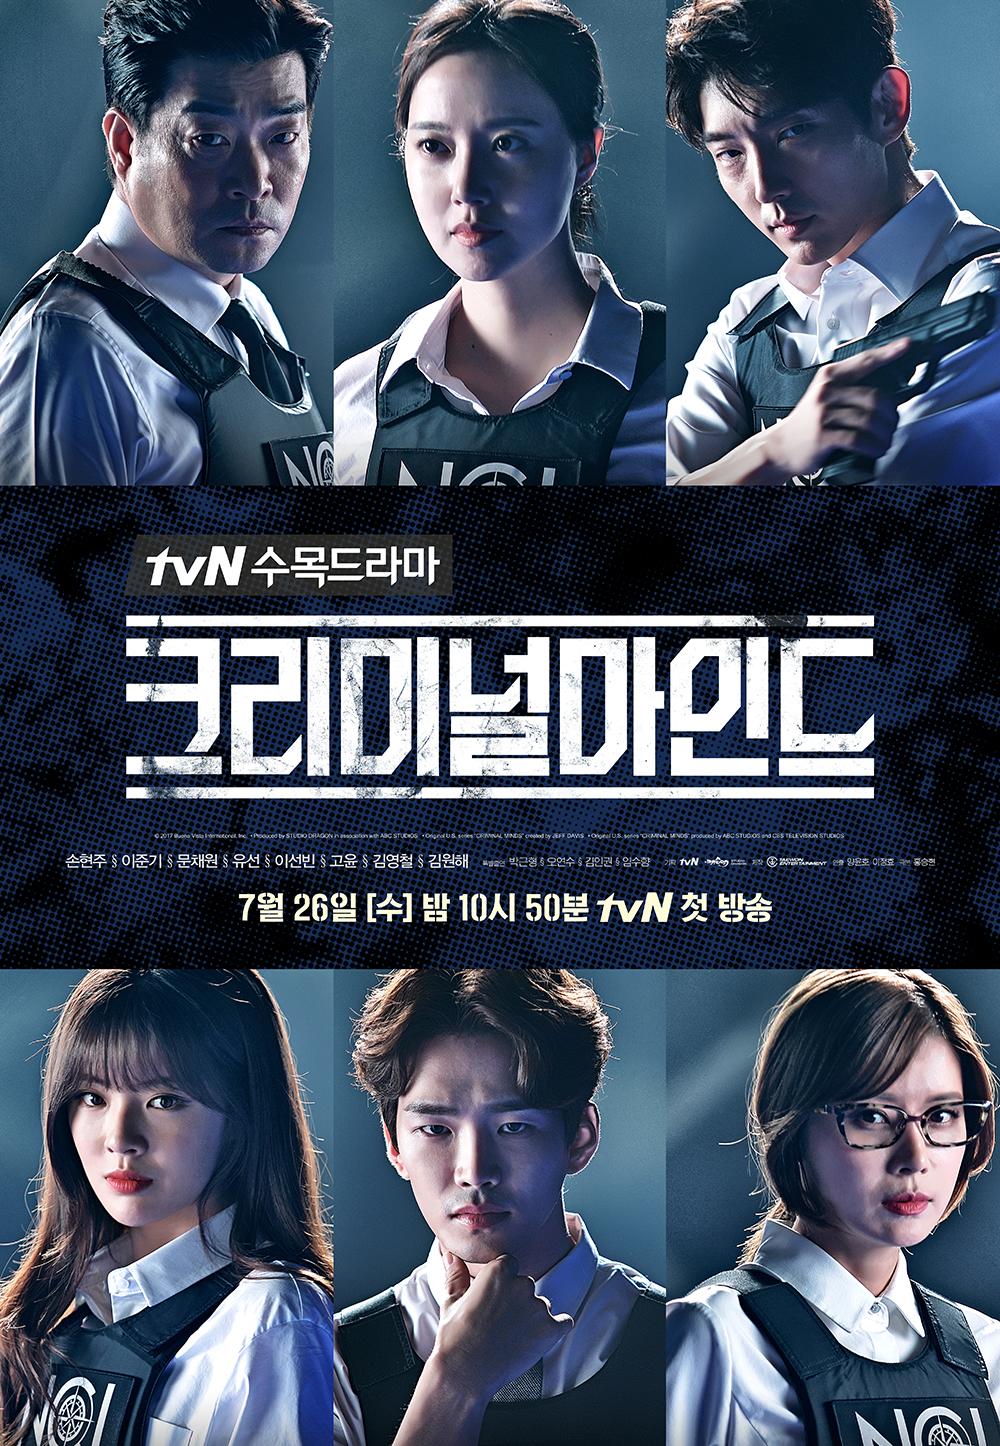 Drama Korea adaptasi Amerika Serikat asianwiki